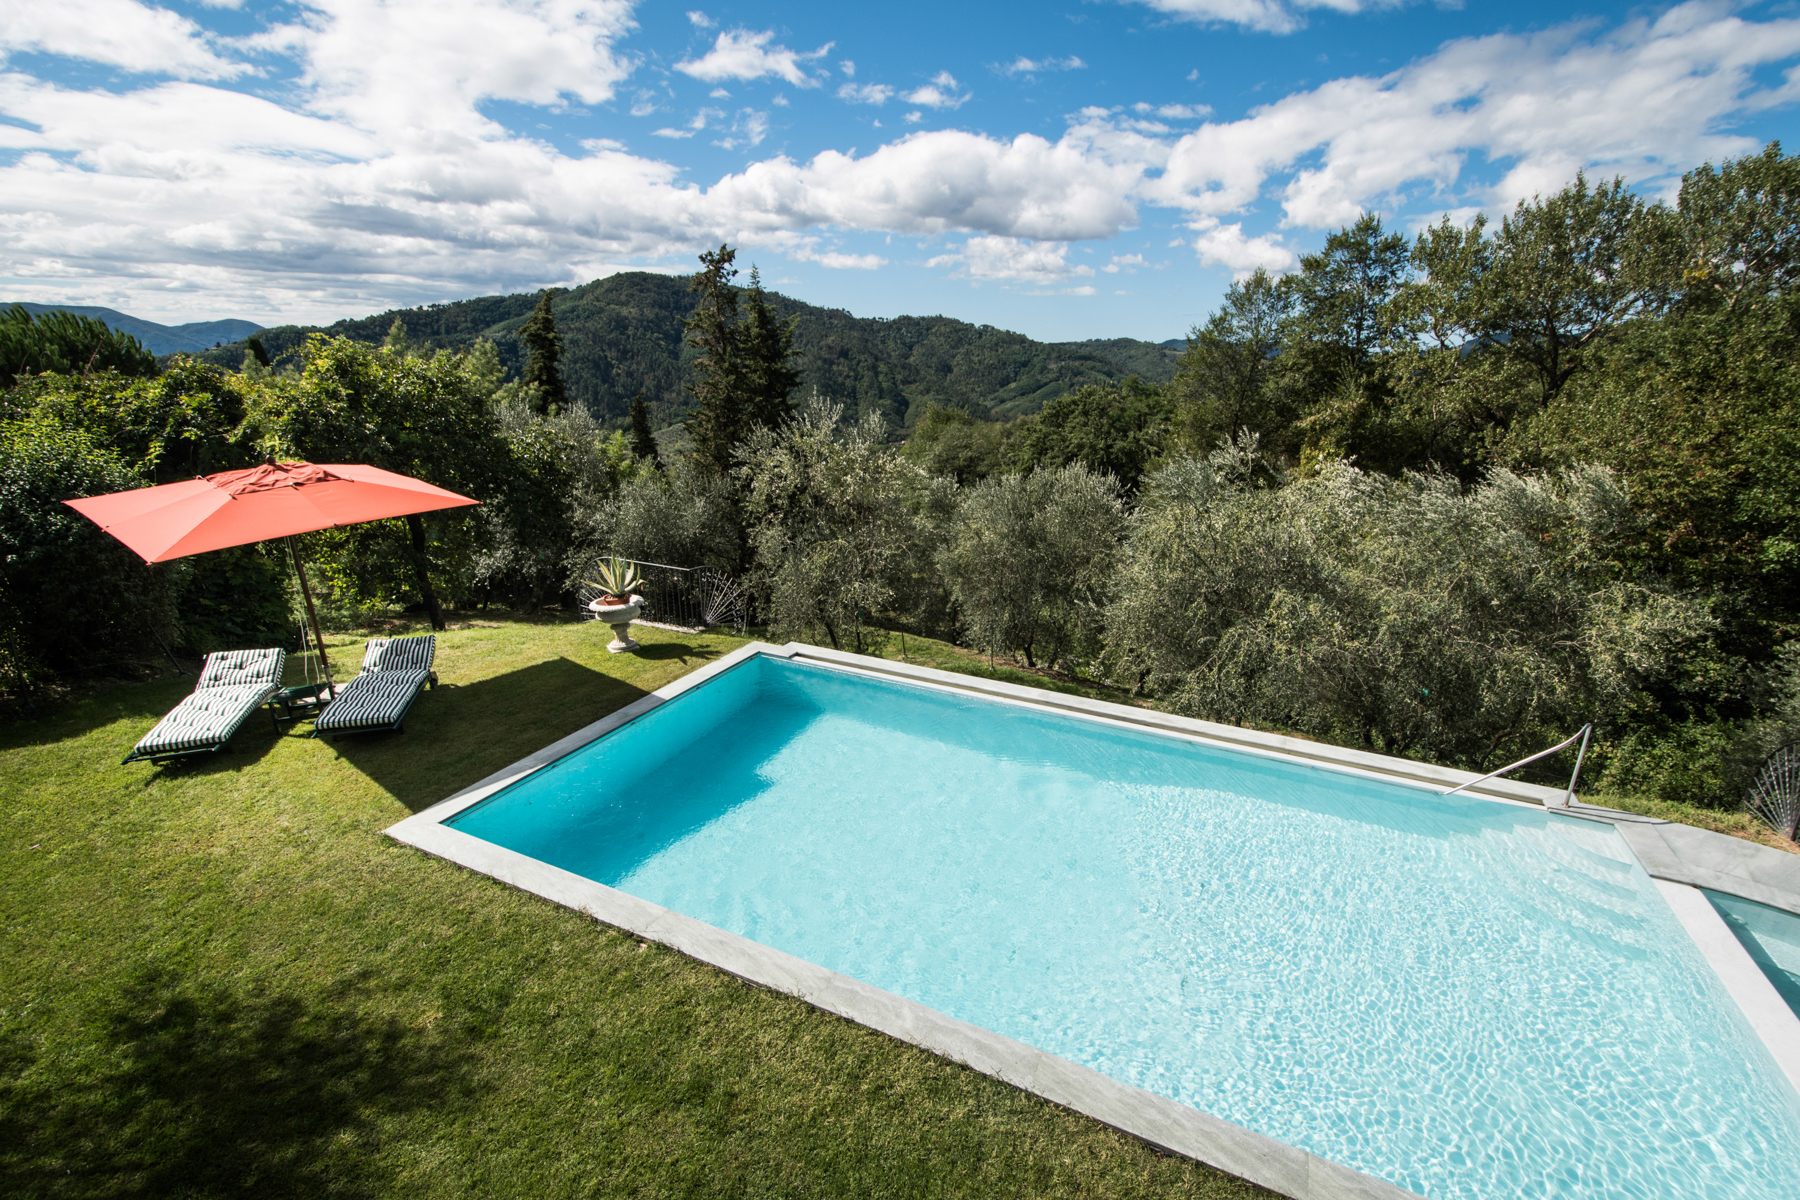 Villa in Vendita a Lucca: 5 locali, 1065 mq - Foto 24